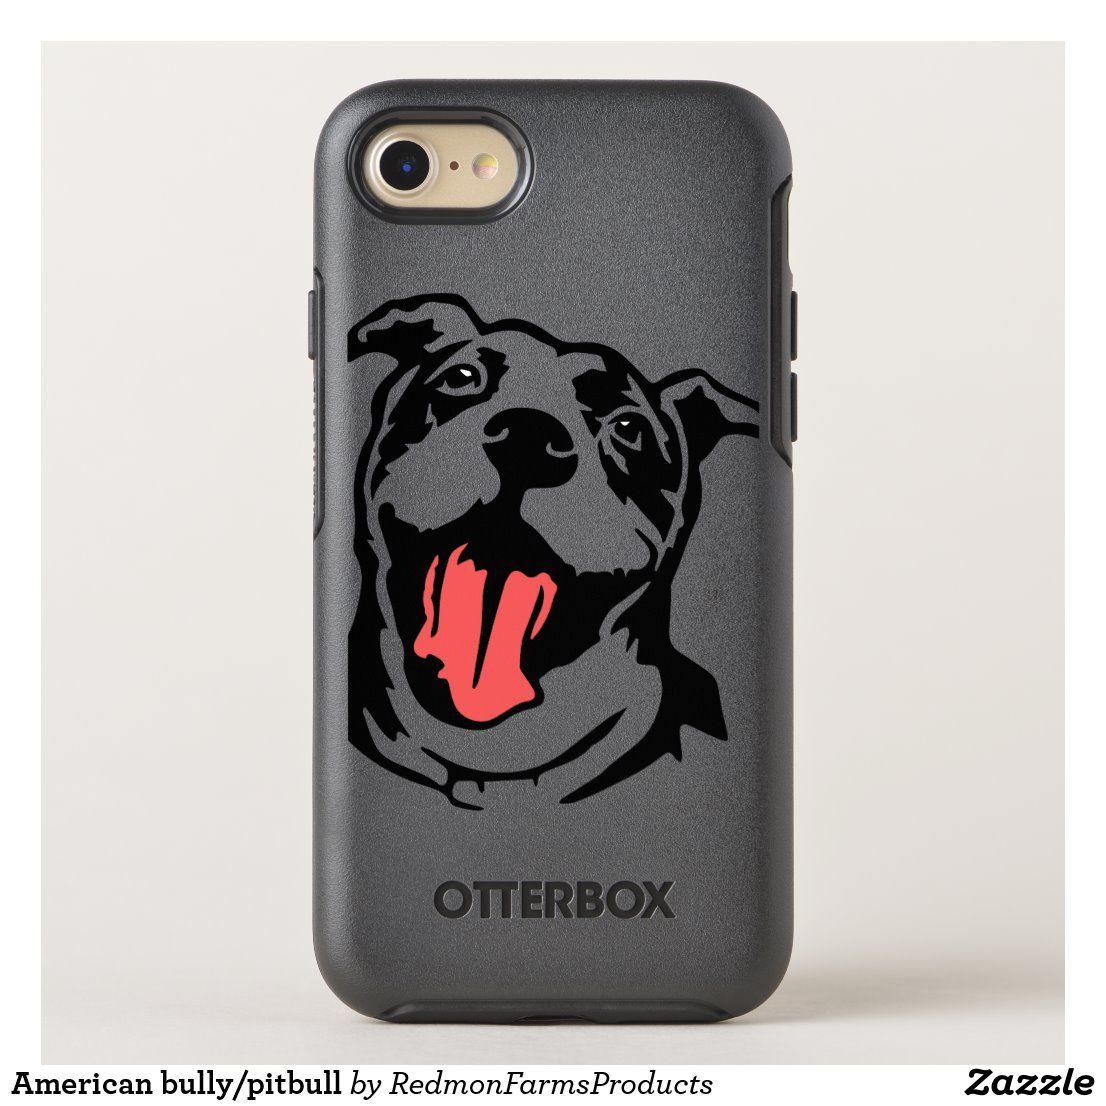 American bully/pitbull OtterBox iPhone case | Zazzle.com  – Phone Cases